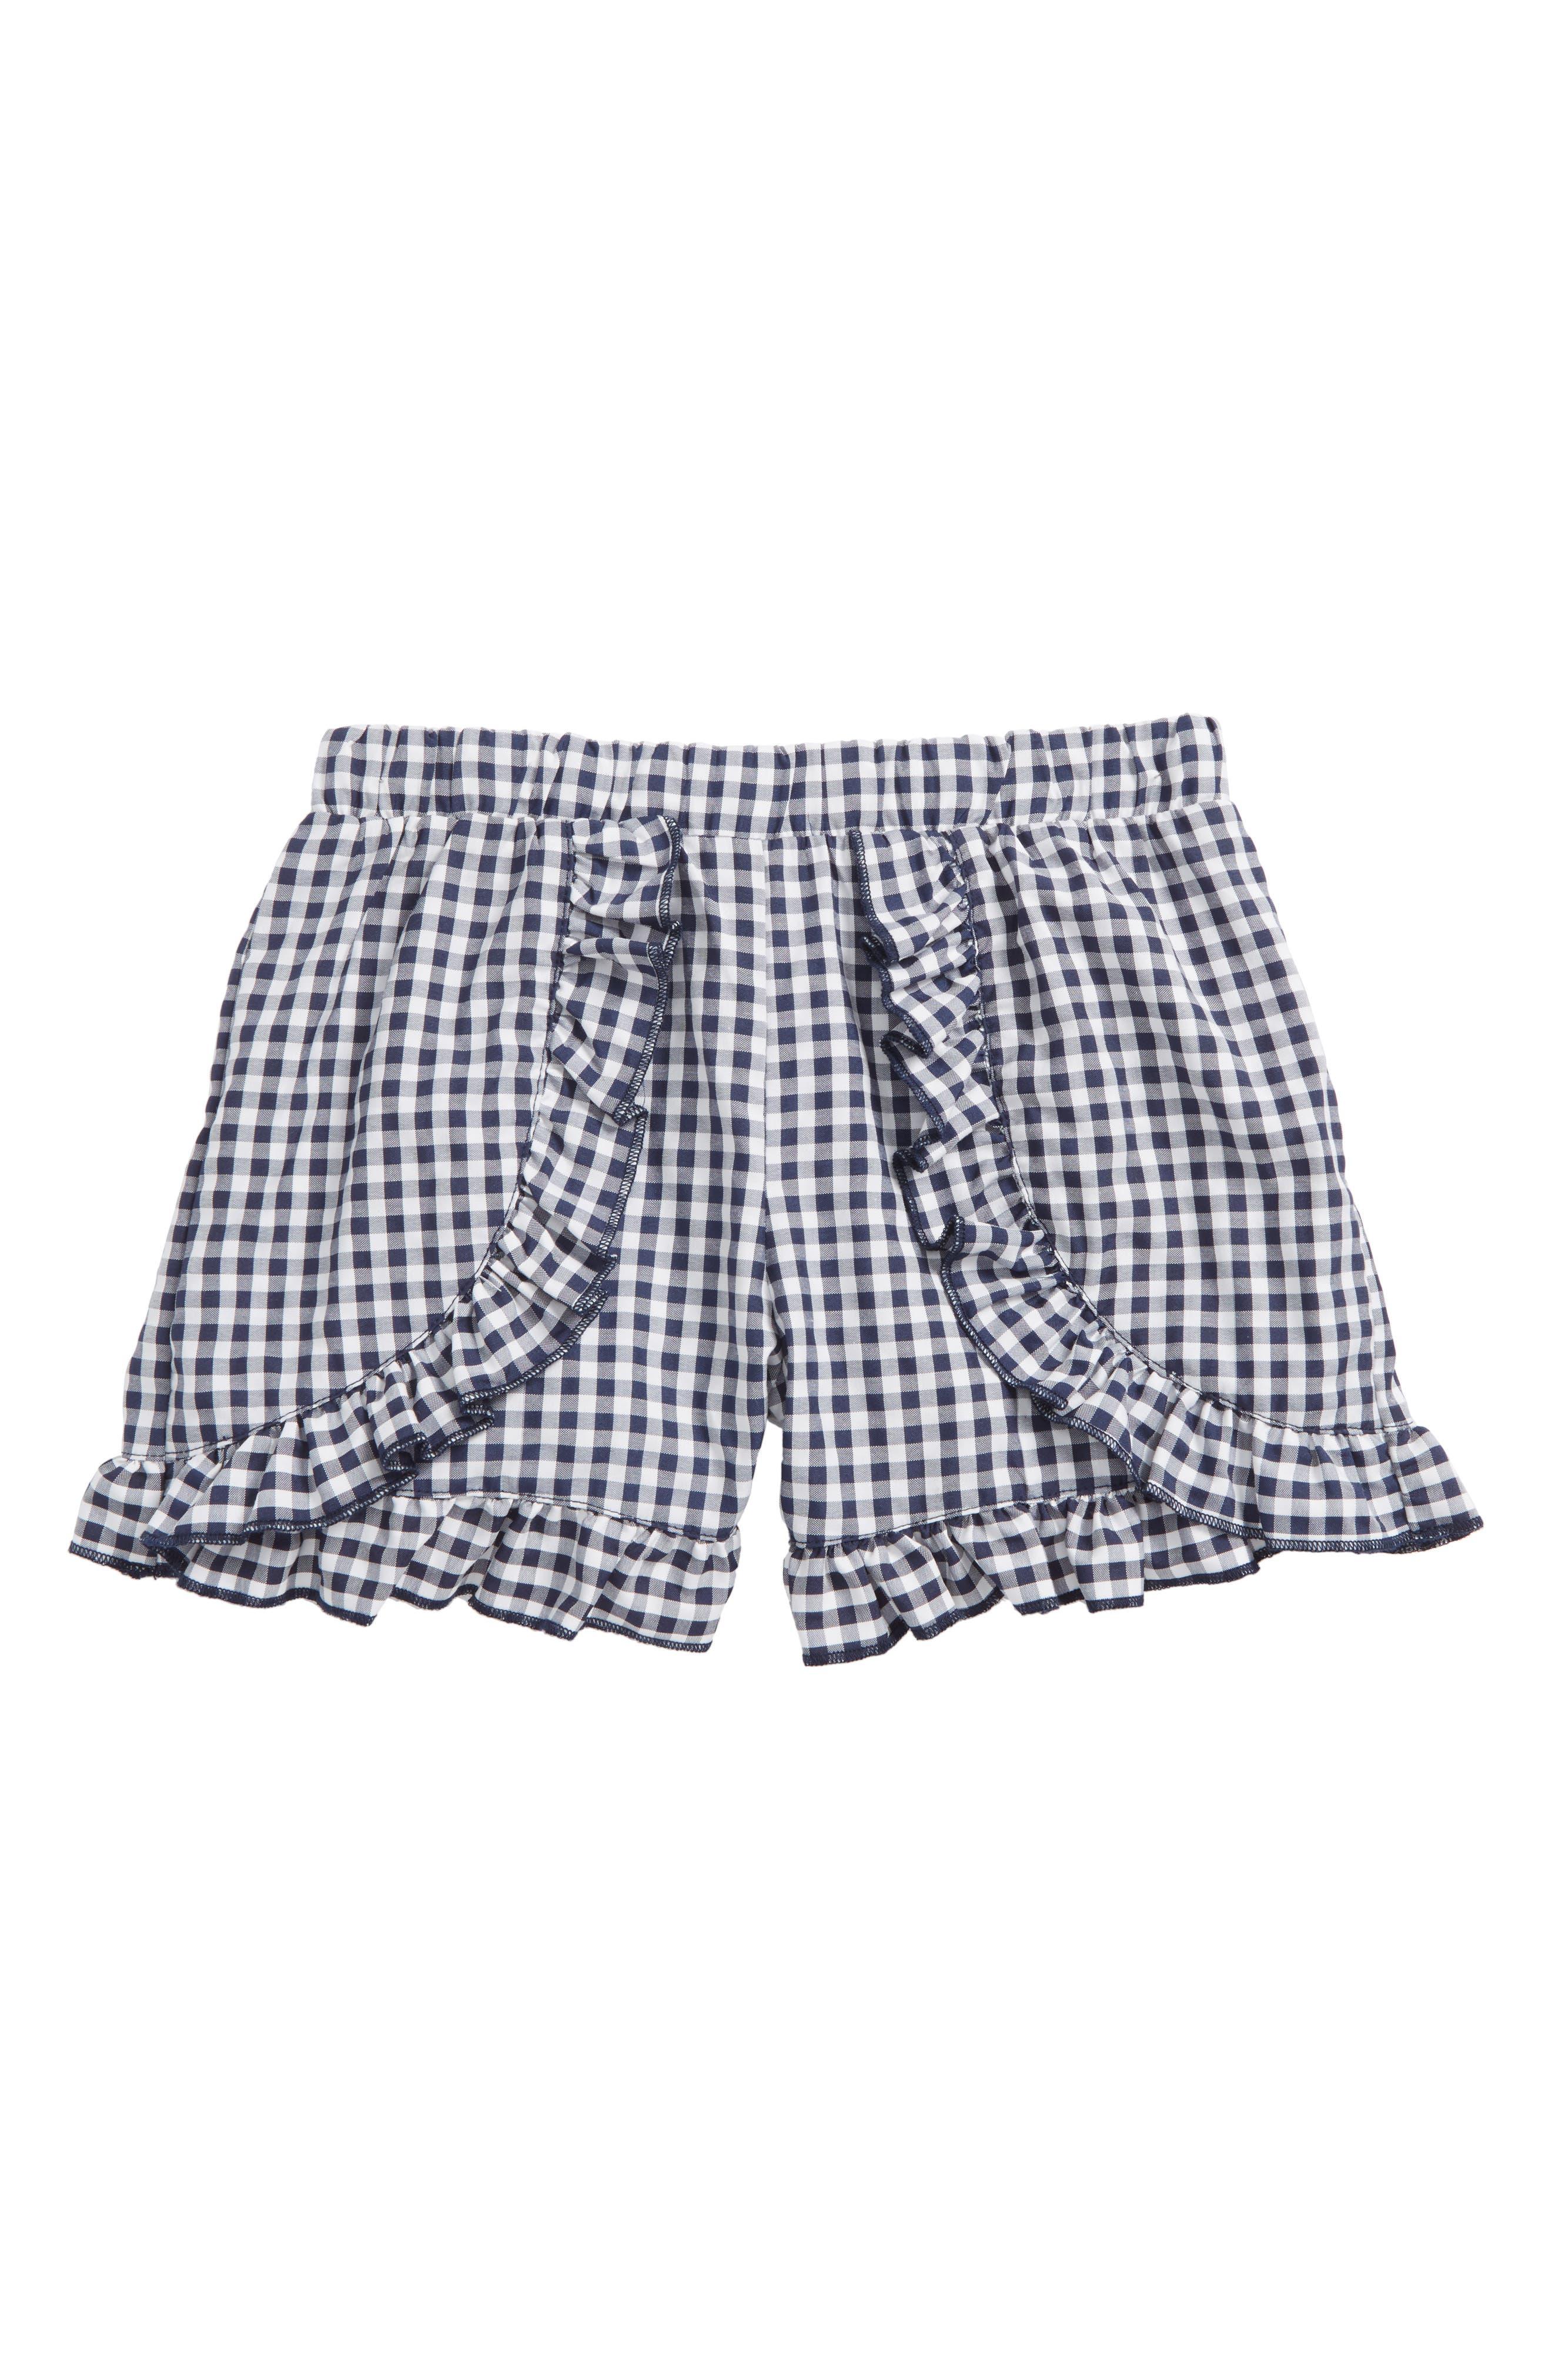 Truly Me Ruffle Gingham Shorts (Toddler Girls & Little Girls)